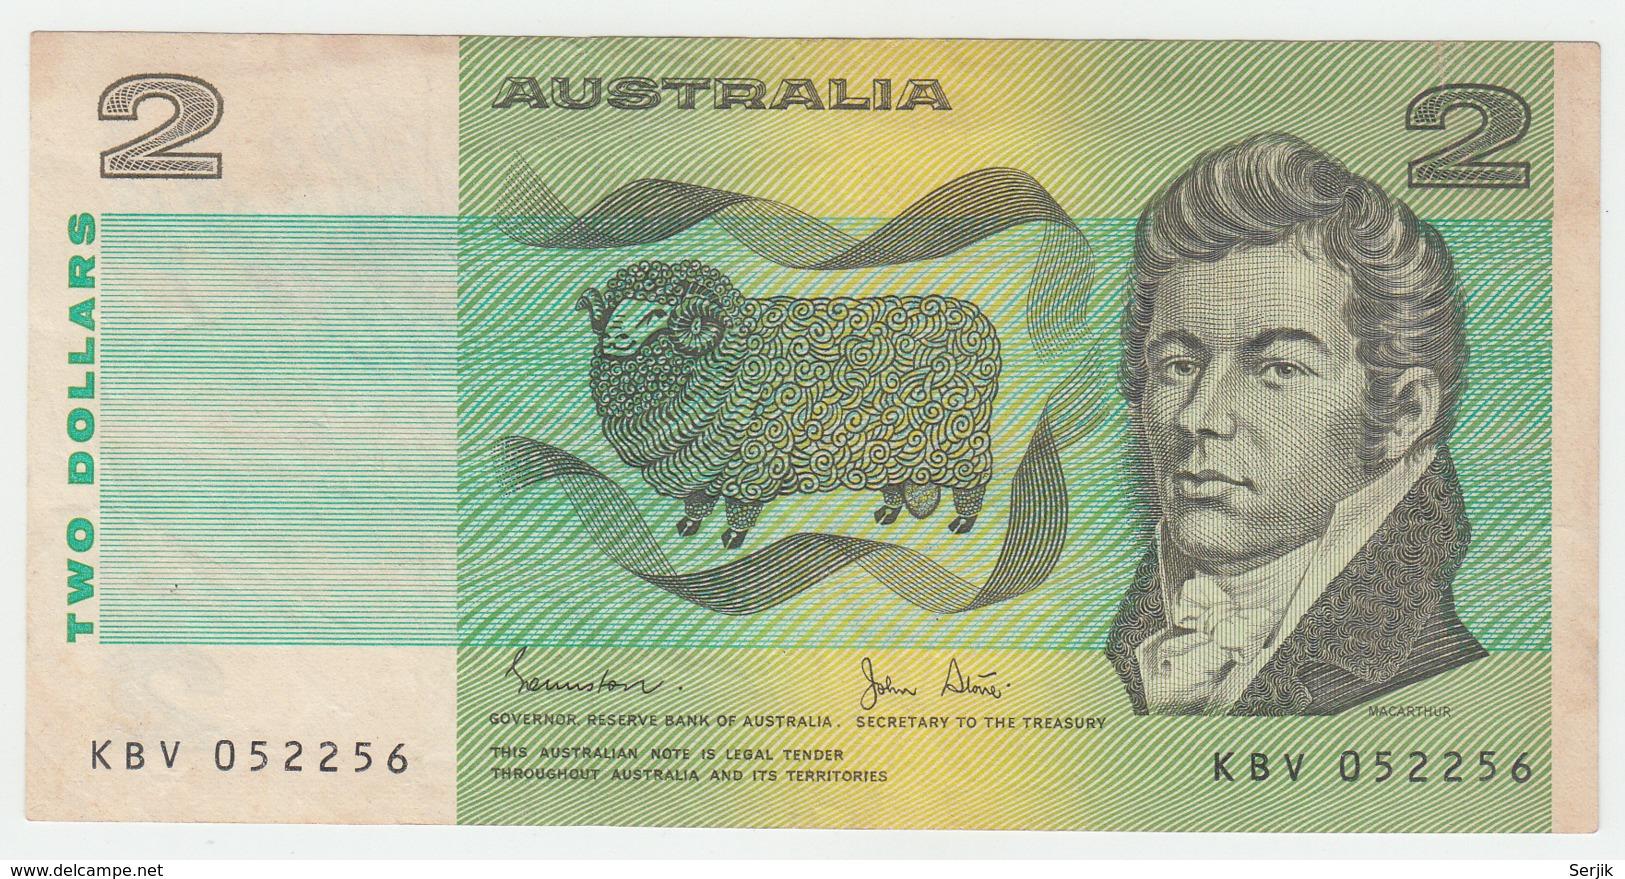 Australia 2 Dollar 1983 VF++ CRISP Banknote Pick 43d 43 D - 1974-94 Australia Reserve Bank